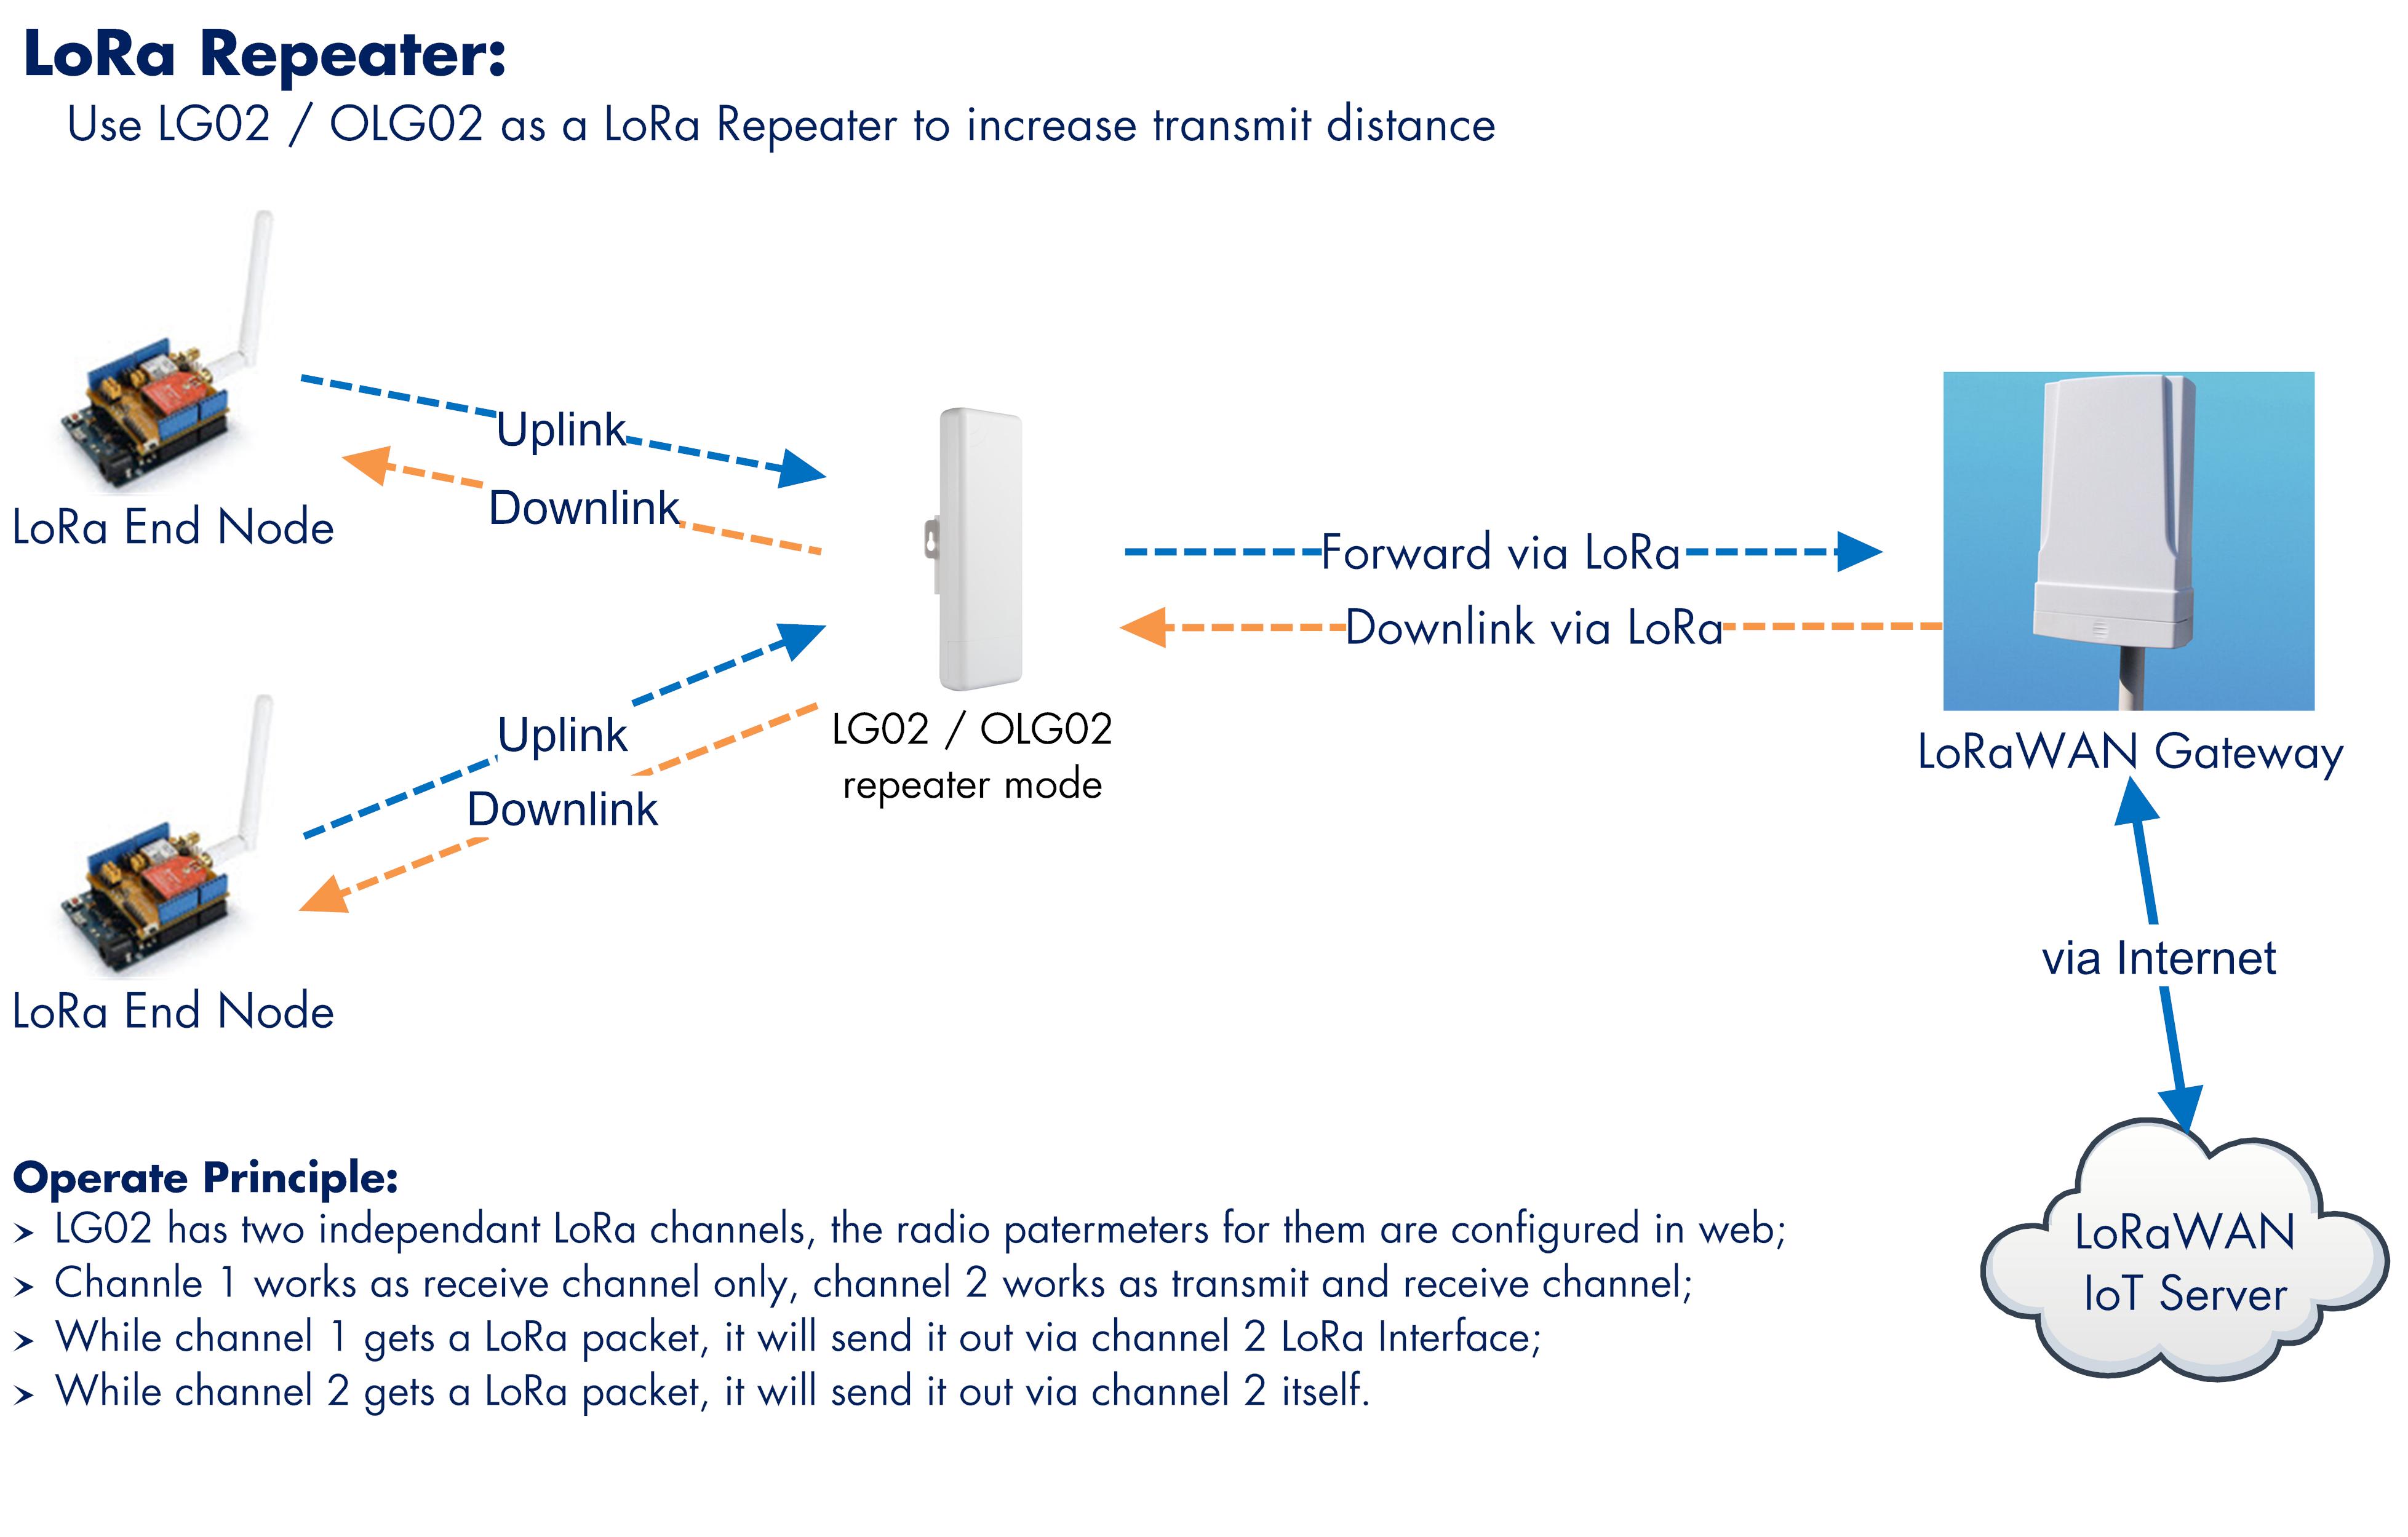 LG02 Dual Channels LoRa IoT Gateway